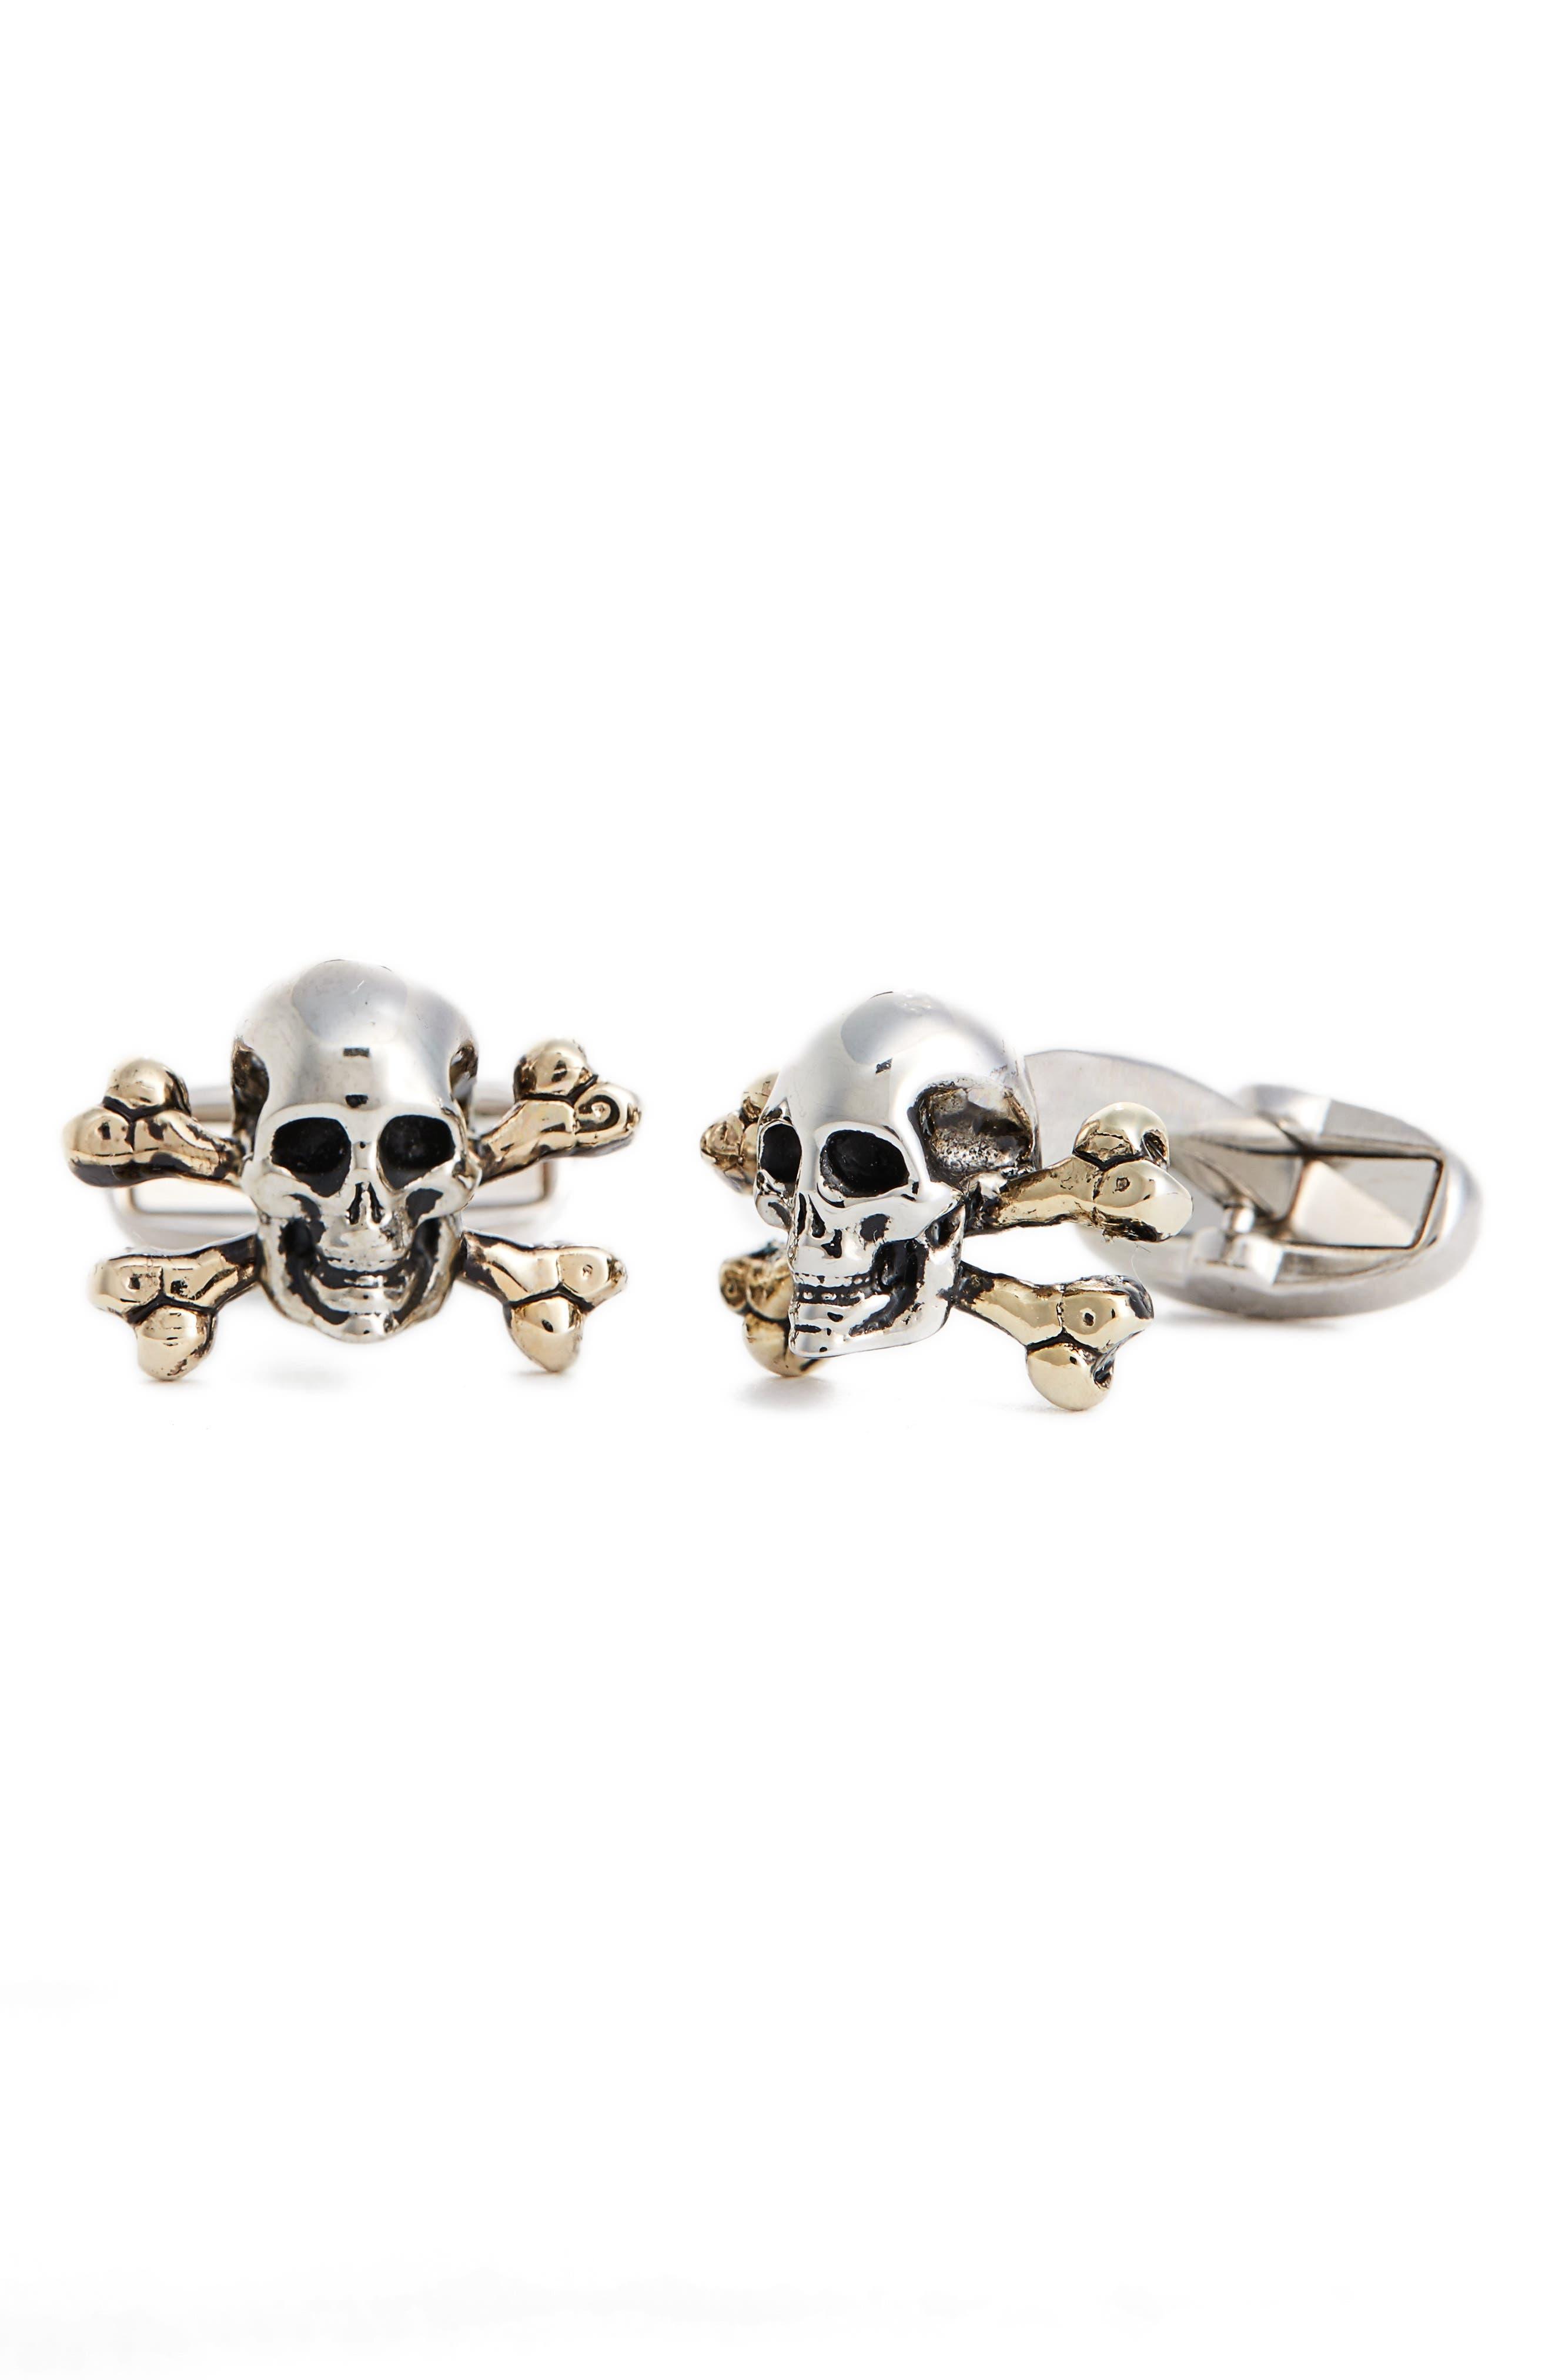 Skull & Crossbones Cuff Links,                             Main thumbnail 1, color,                             Metallic Silver